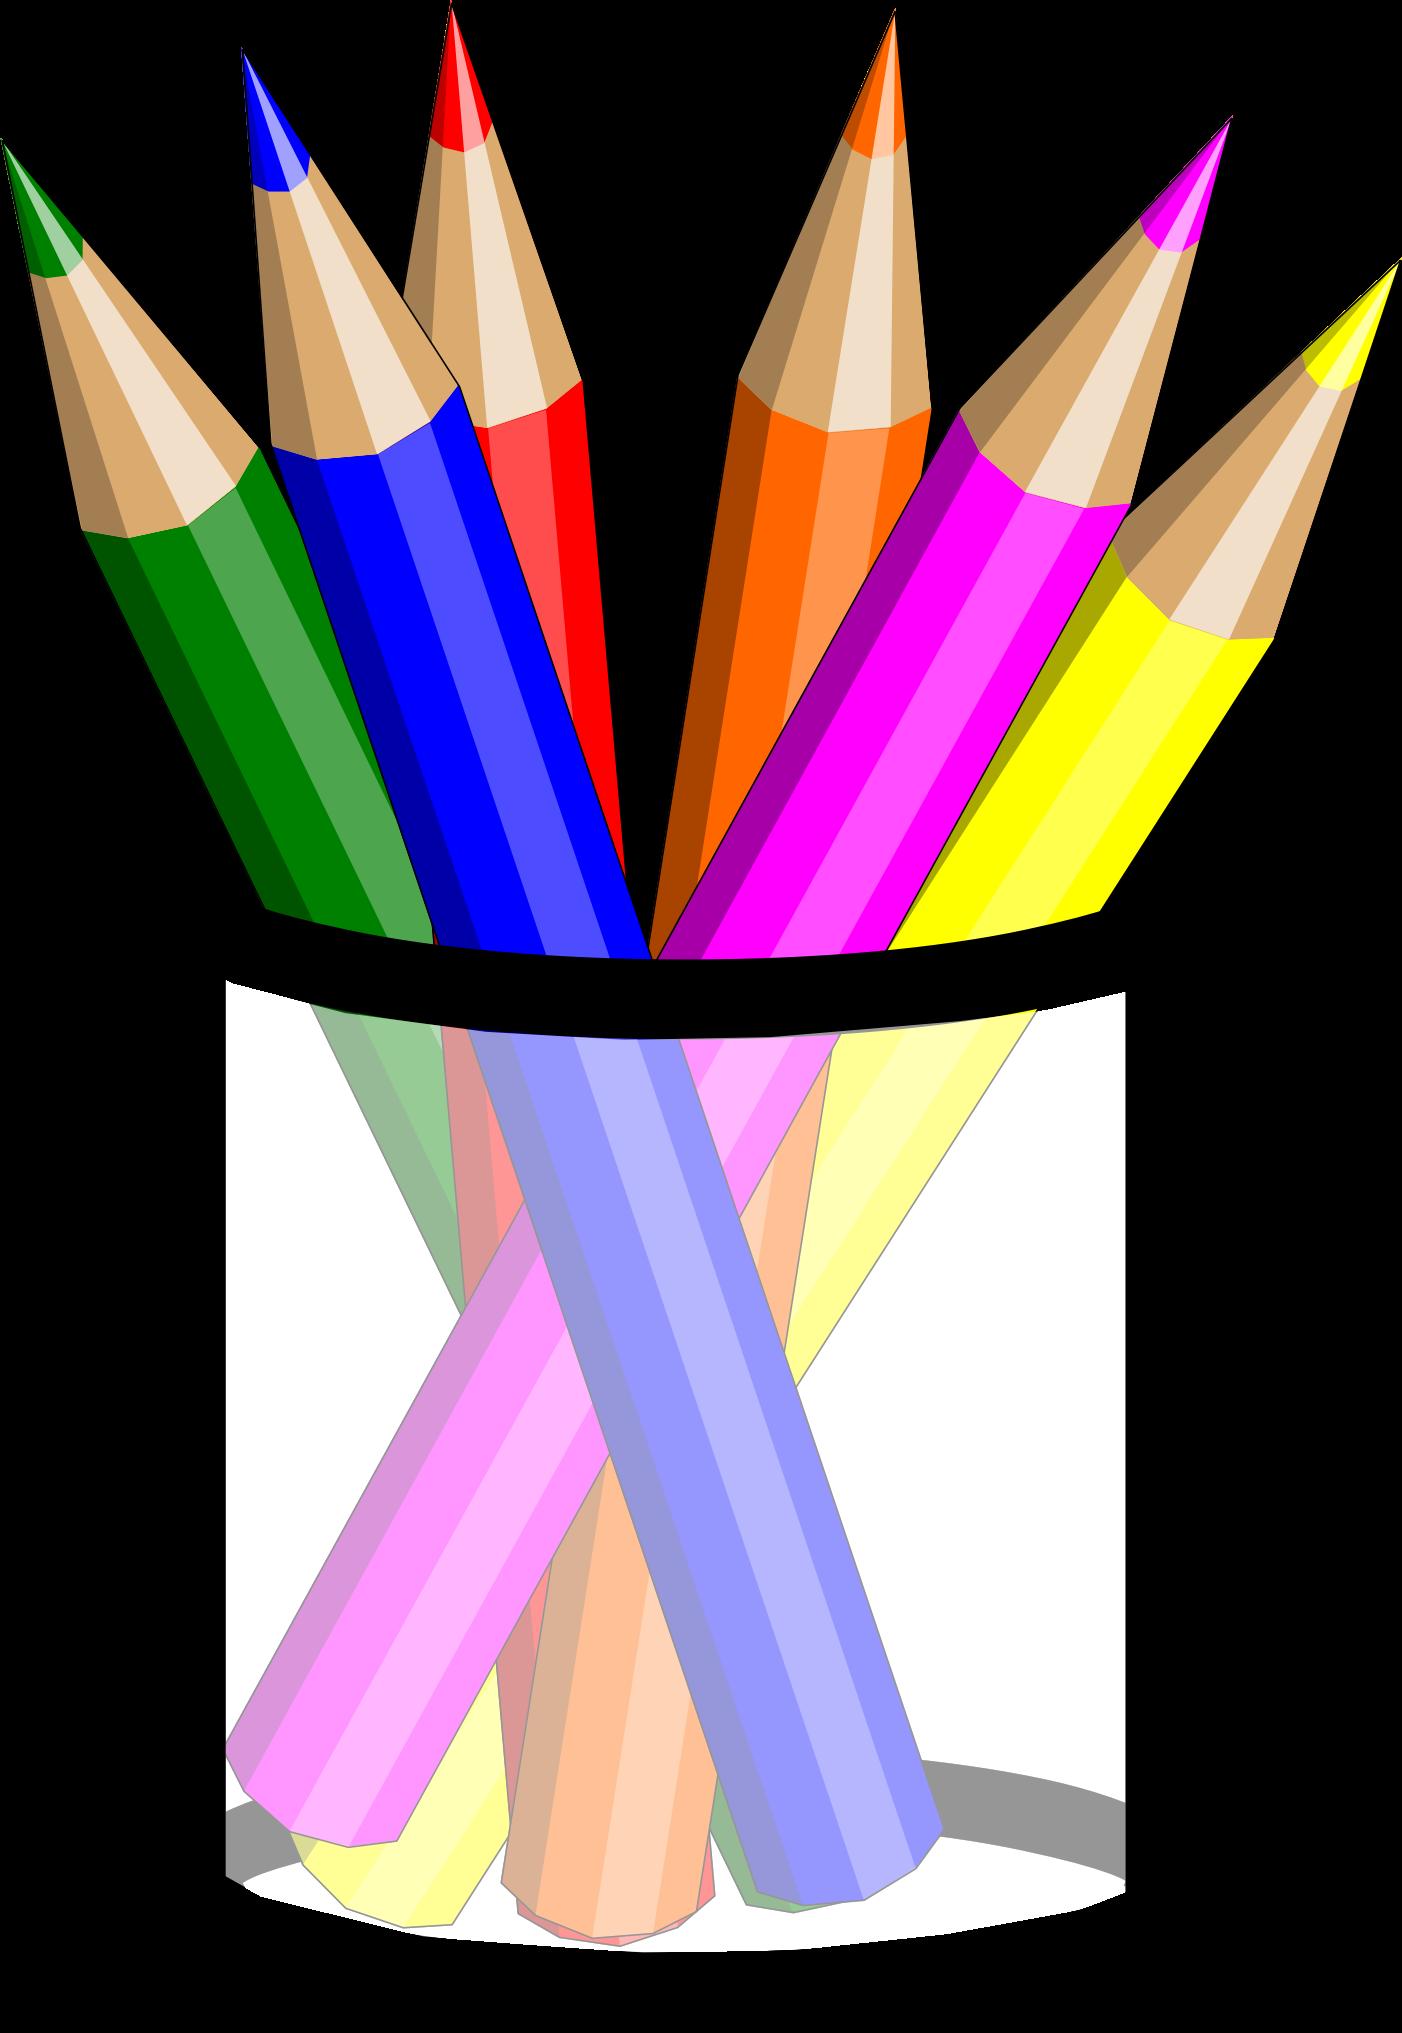 Pencils clipart jpg stock 81+ Pencils Clip Art | ClipartLook jpg stock